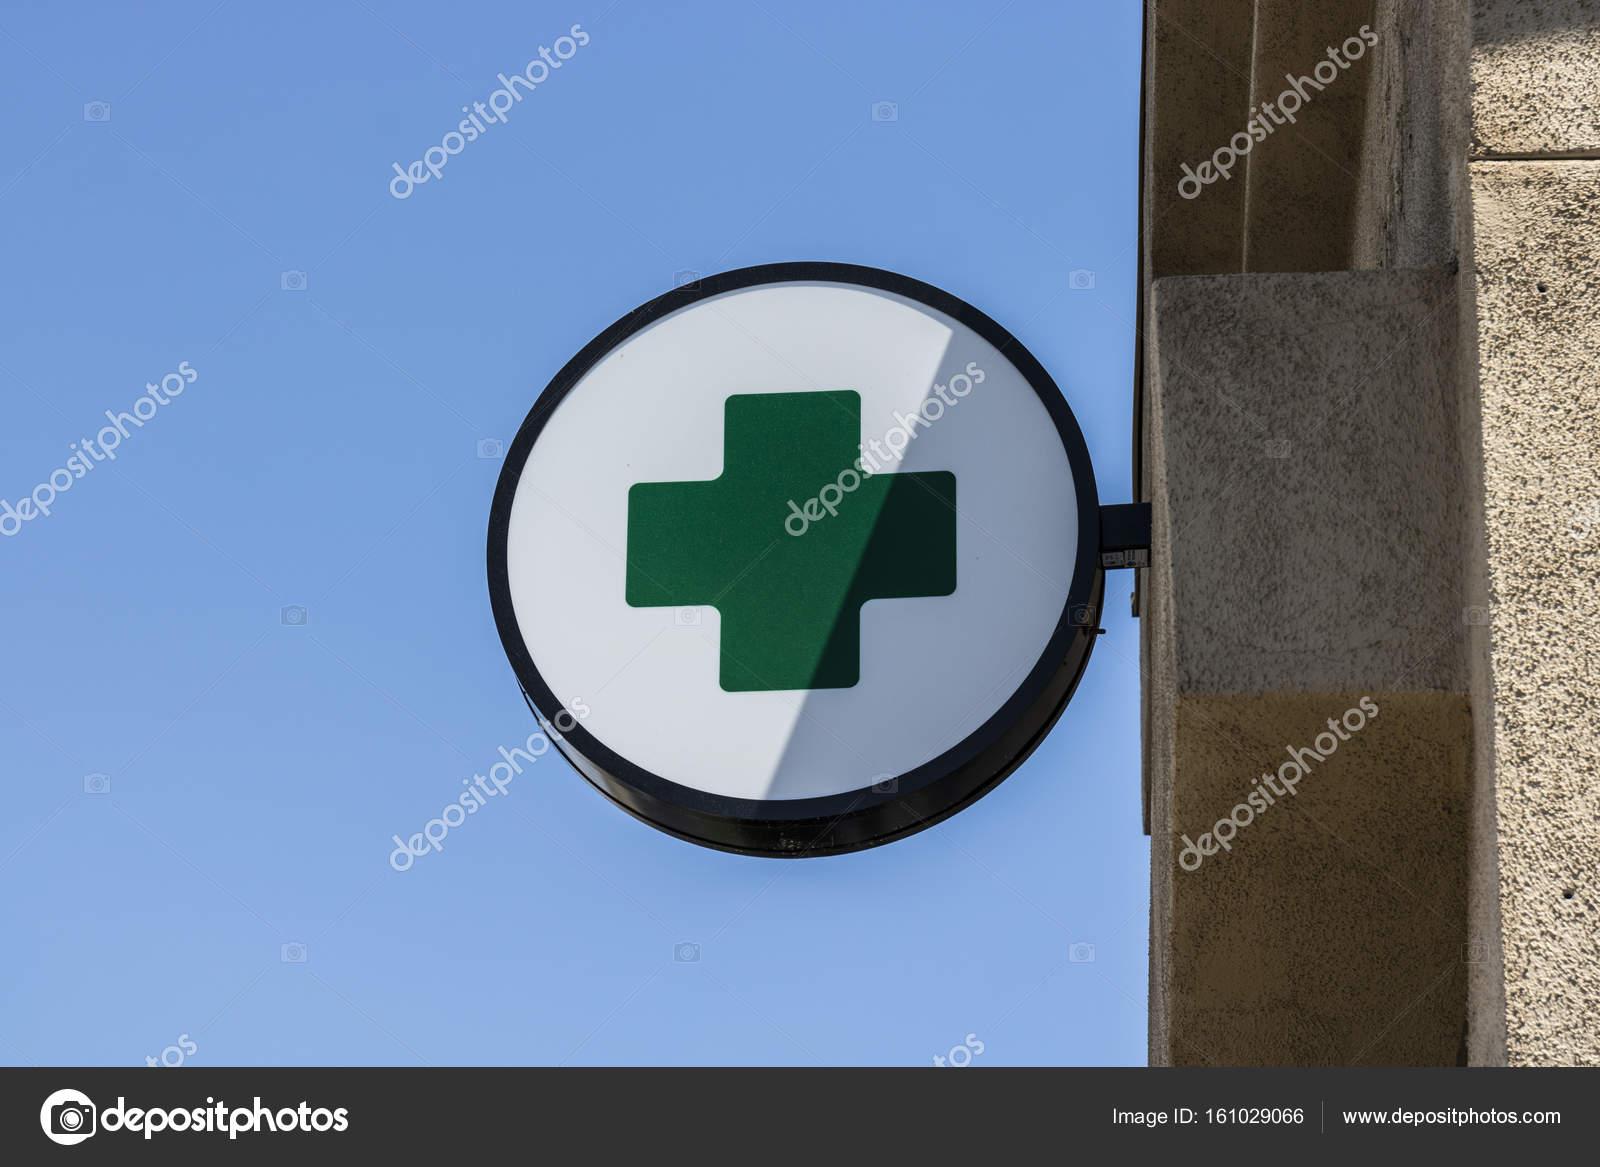 Las Vegas Circa July 2017 Green Cross Sign The Green Cross Is A